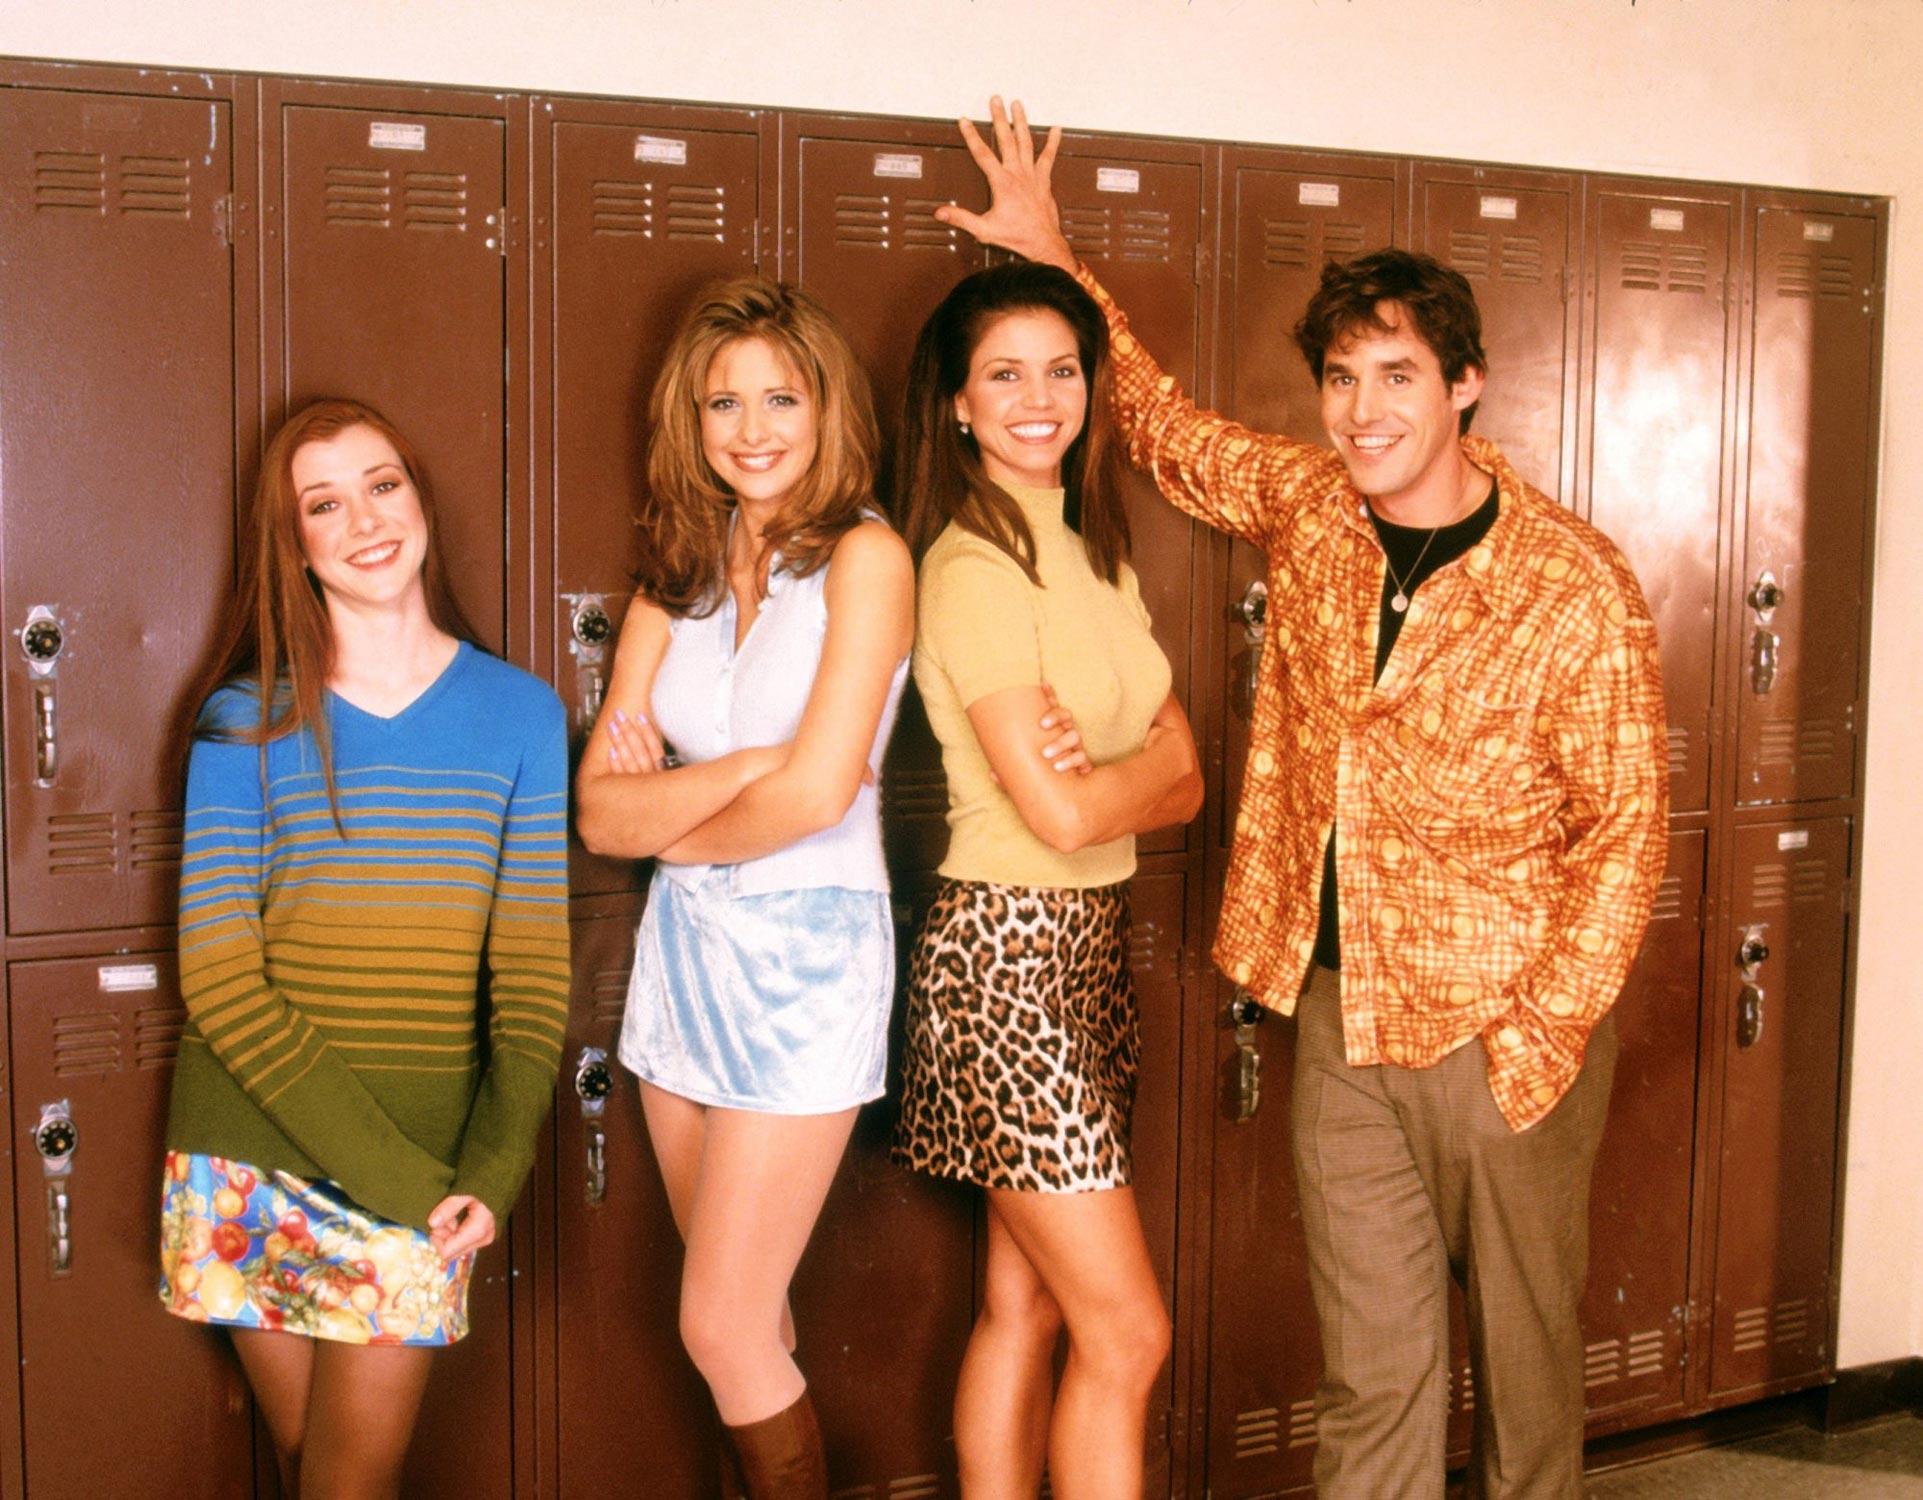 Buffy the Vampire Slayer Season 1 - Netflix review